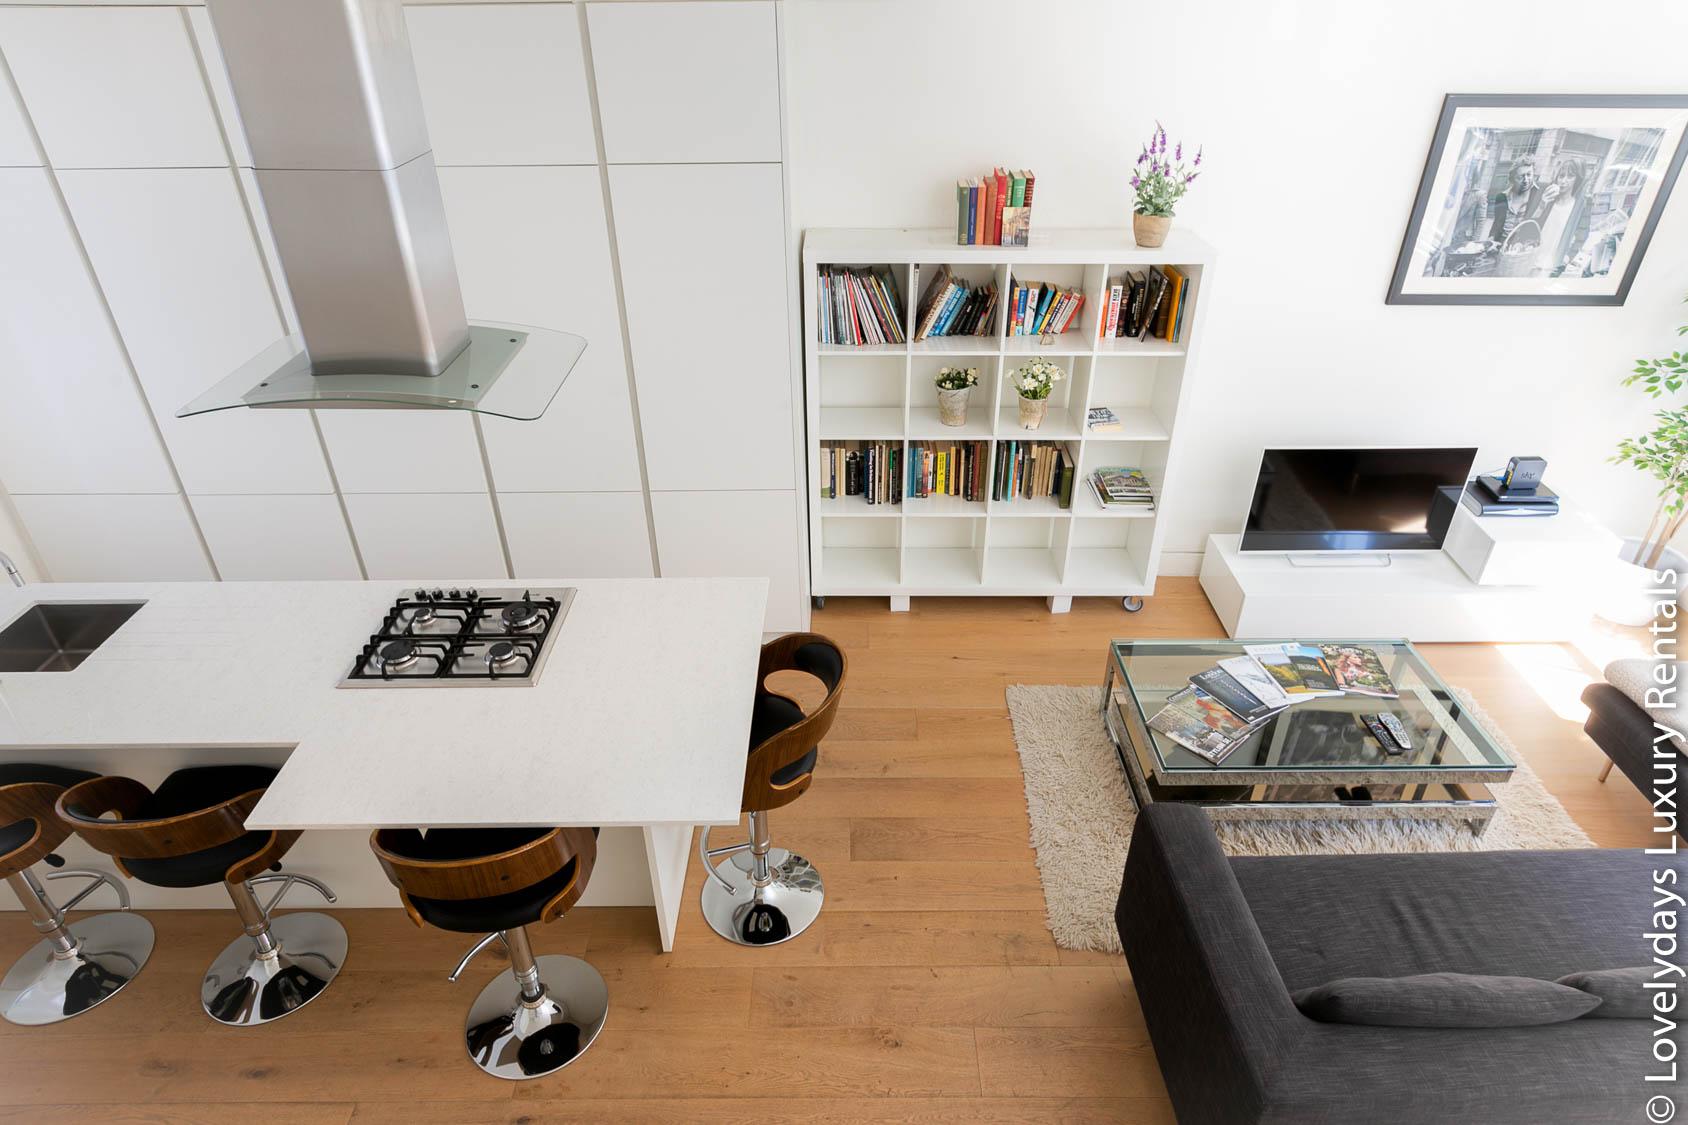 Lovelydays luxury service apartment rental - London - Fitzrovia - Foley Street - Lovelysuite - 2 bedrooms - 2 bathrooms - Luxury living room - 200b2700d725 - Lovelydays